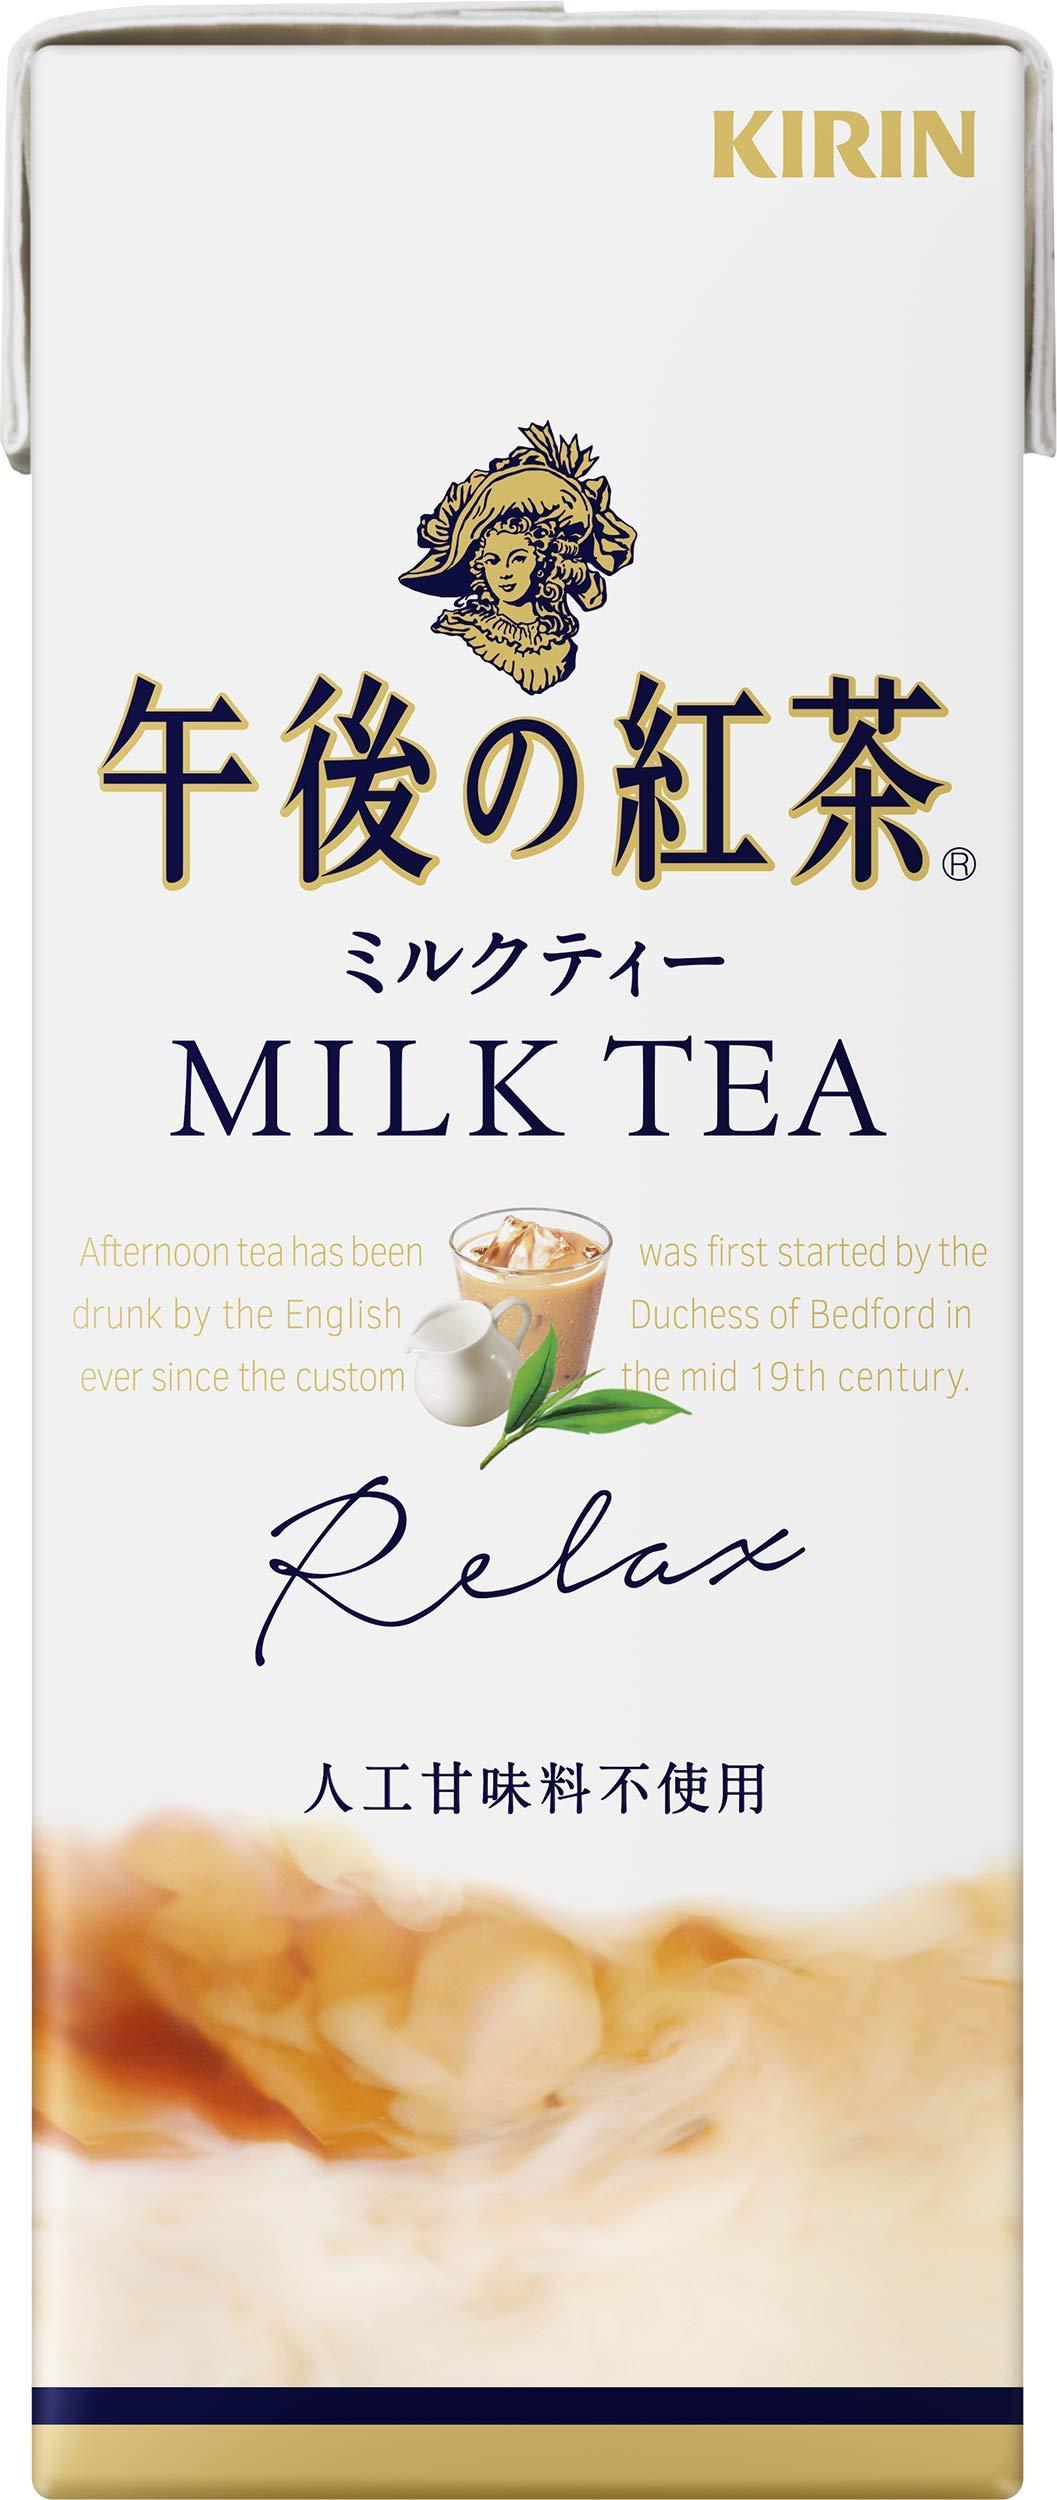 250mlX24 this Kirin afternoon tea milk tea by Afternoon tea